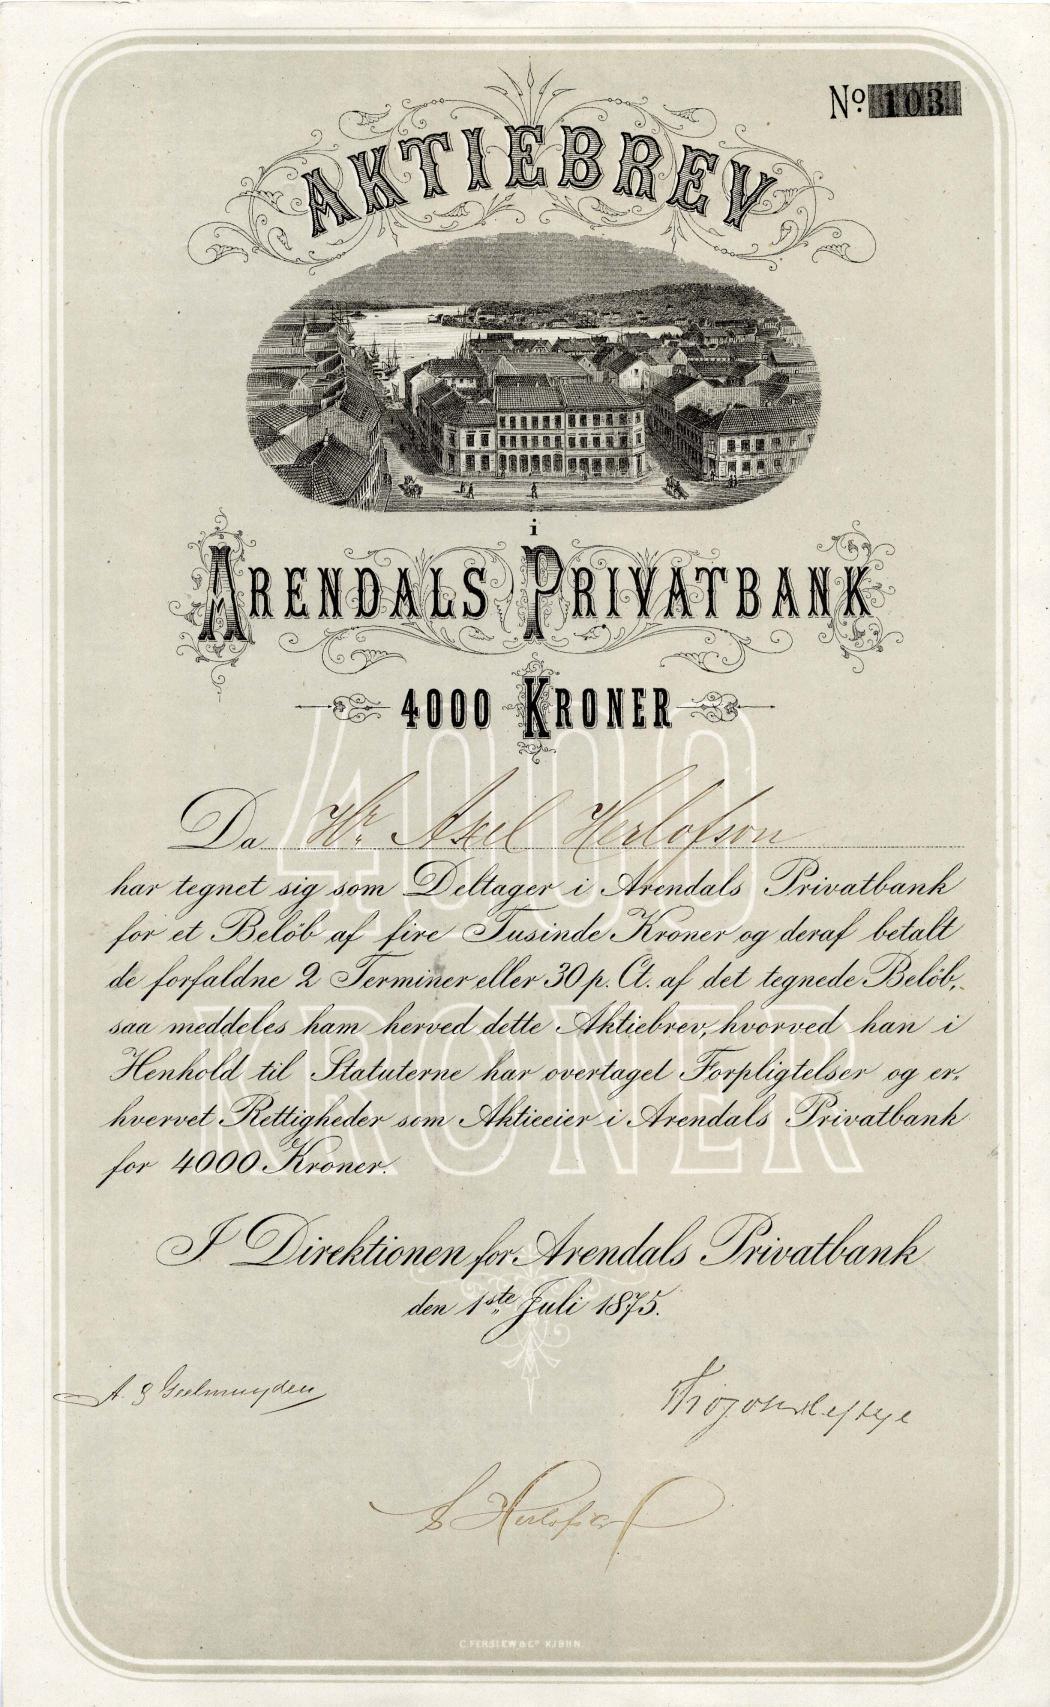 arendals-privatbank_1875_4000